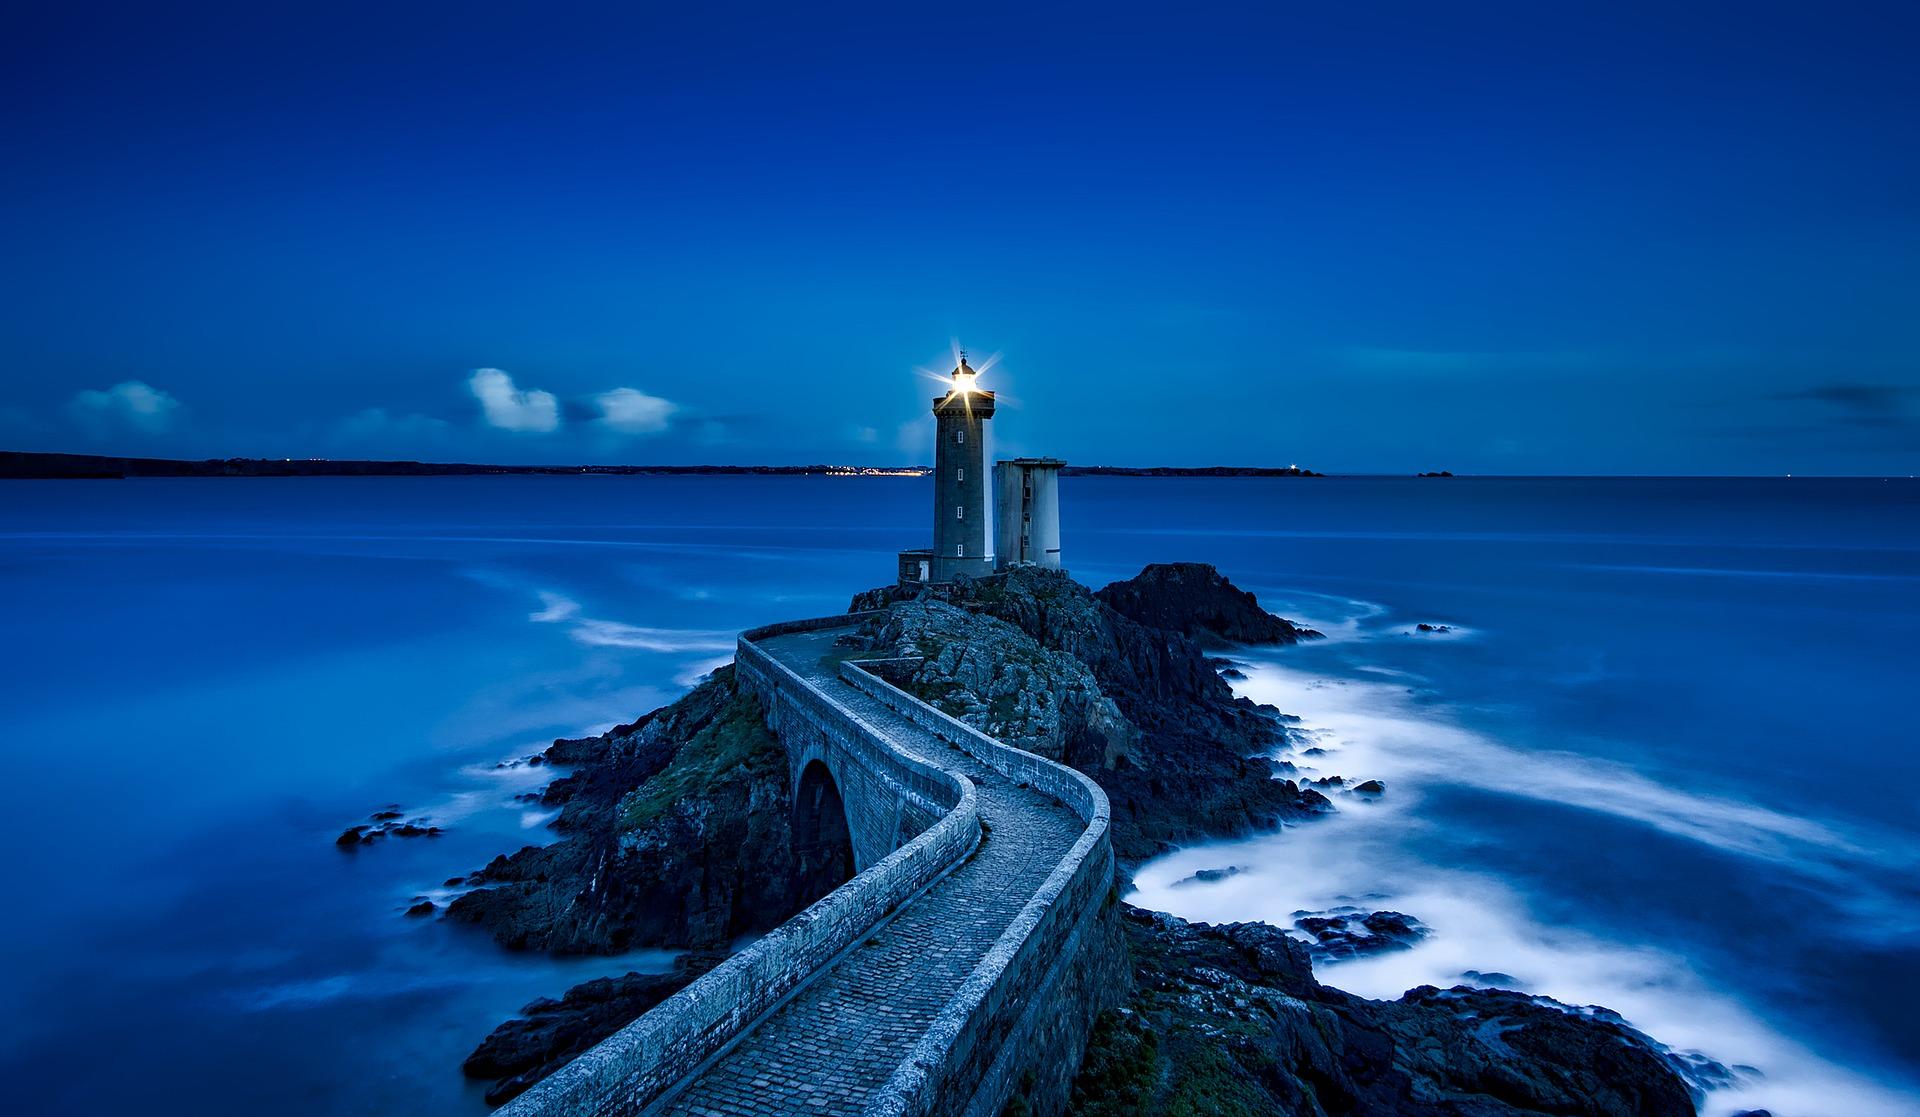 WeggeFAIRte-Leuchtturm